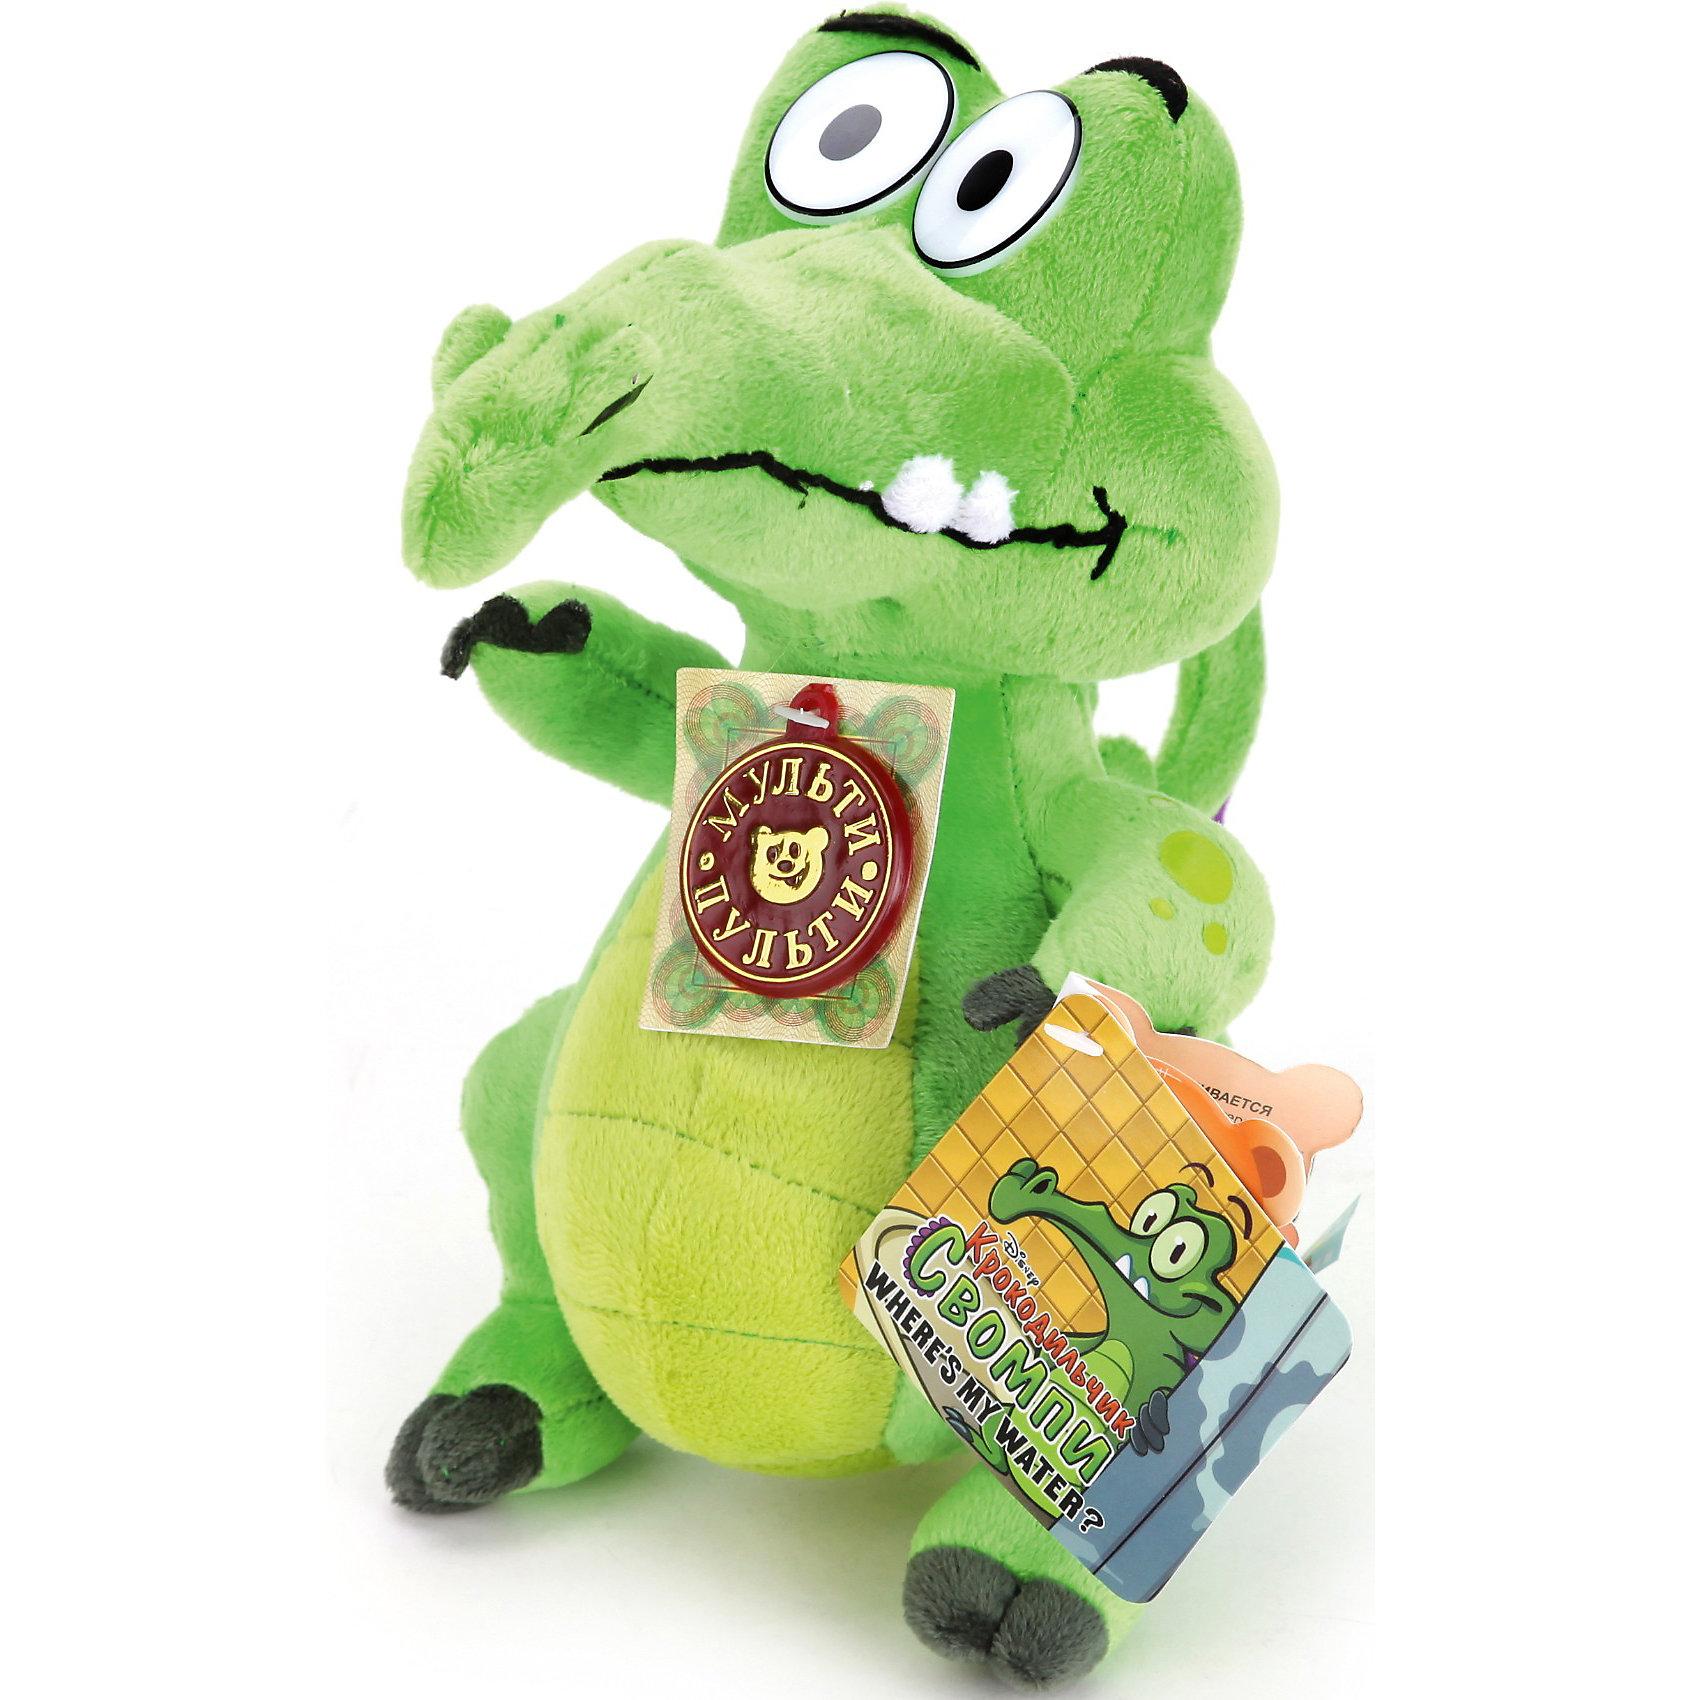 МУЛЬТИ-ПУЛЬТИ Мягкая игрушка Крокодильчик Свомпи  (where is my water), со звуком, 20 см, МУЛЬТИ-ПУЛЬТИ мульти пульти мягкая игрушка серый мышонок 23 см со звуком кот леопольд мульти пульти